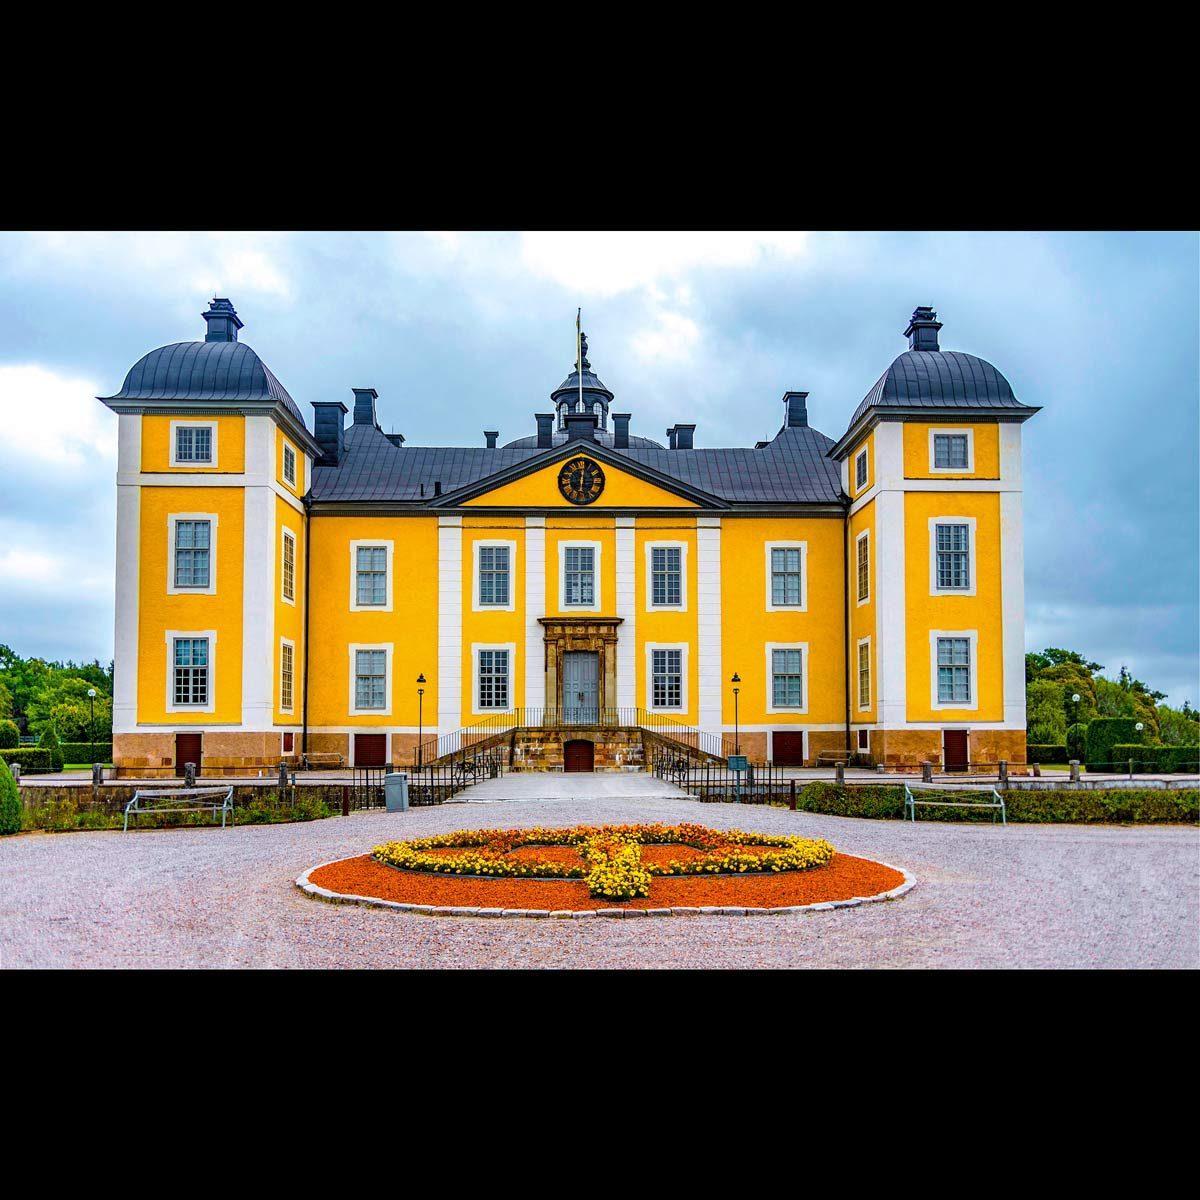 Strömsholm-Palace entrance landscape